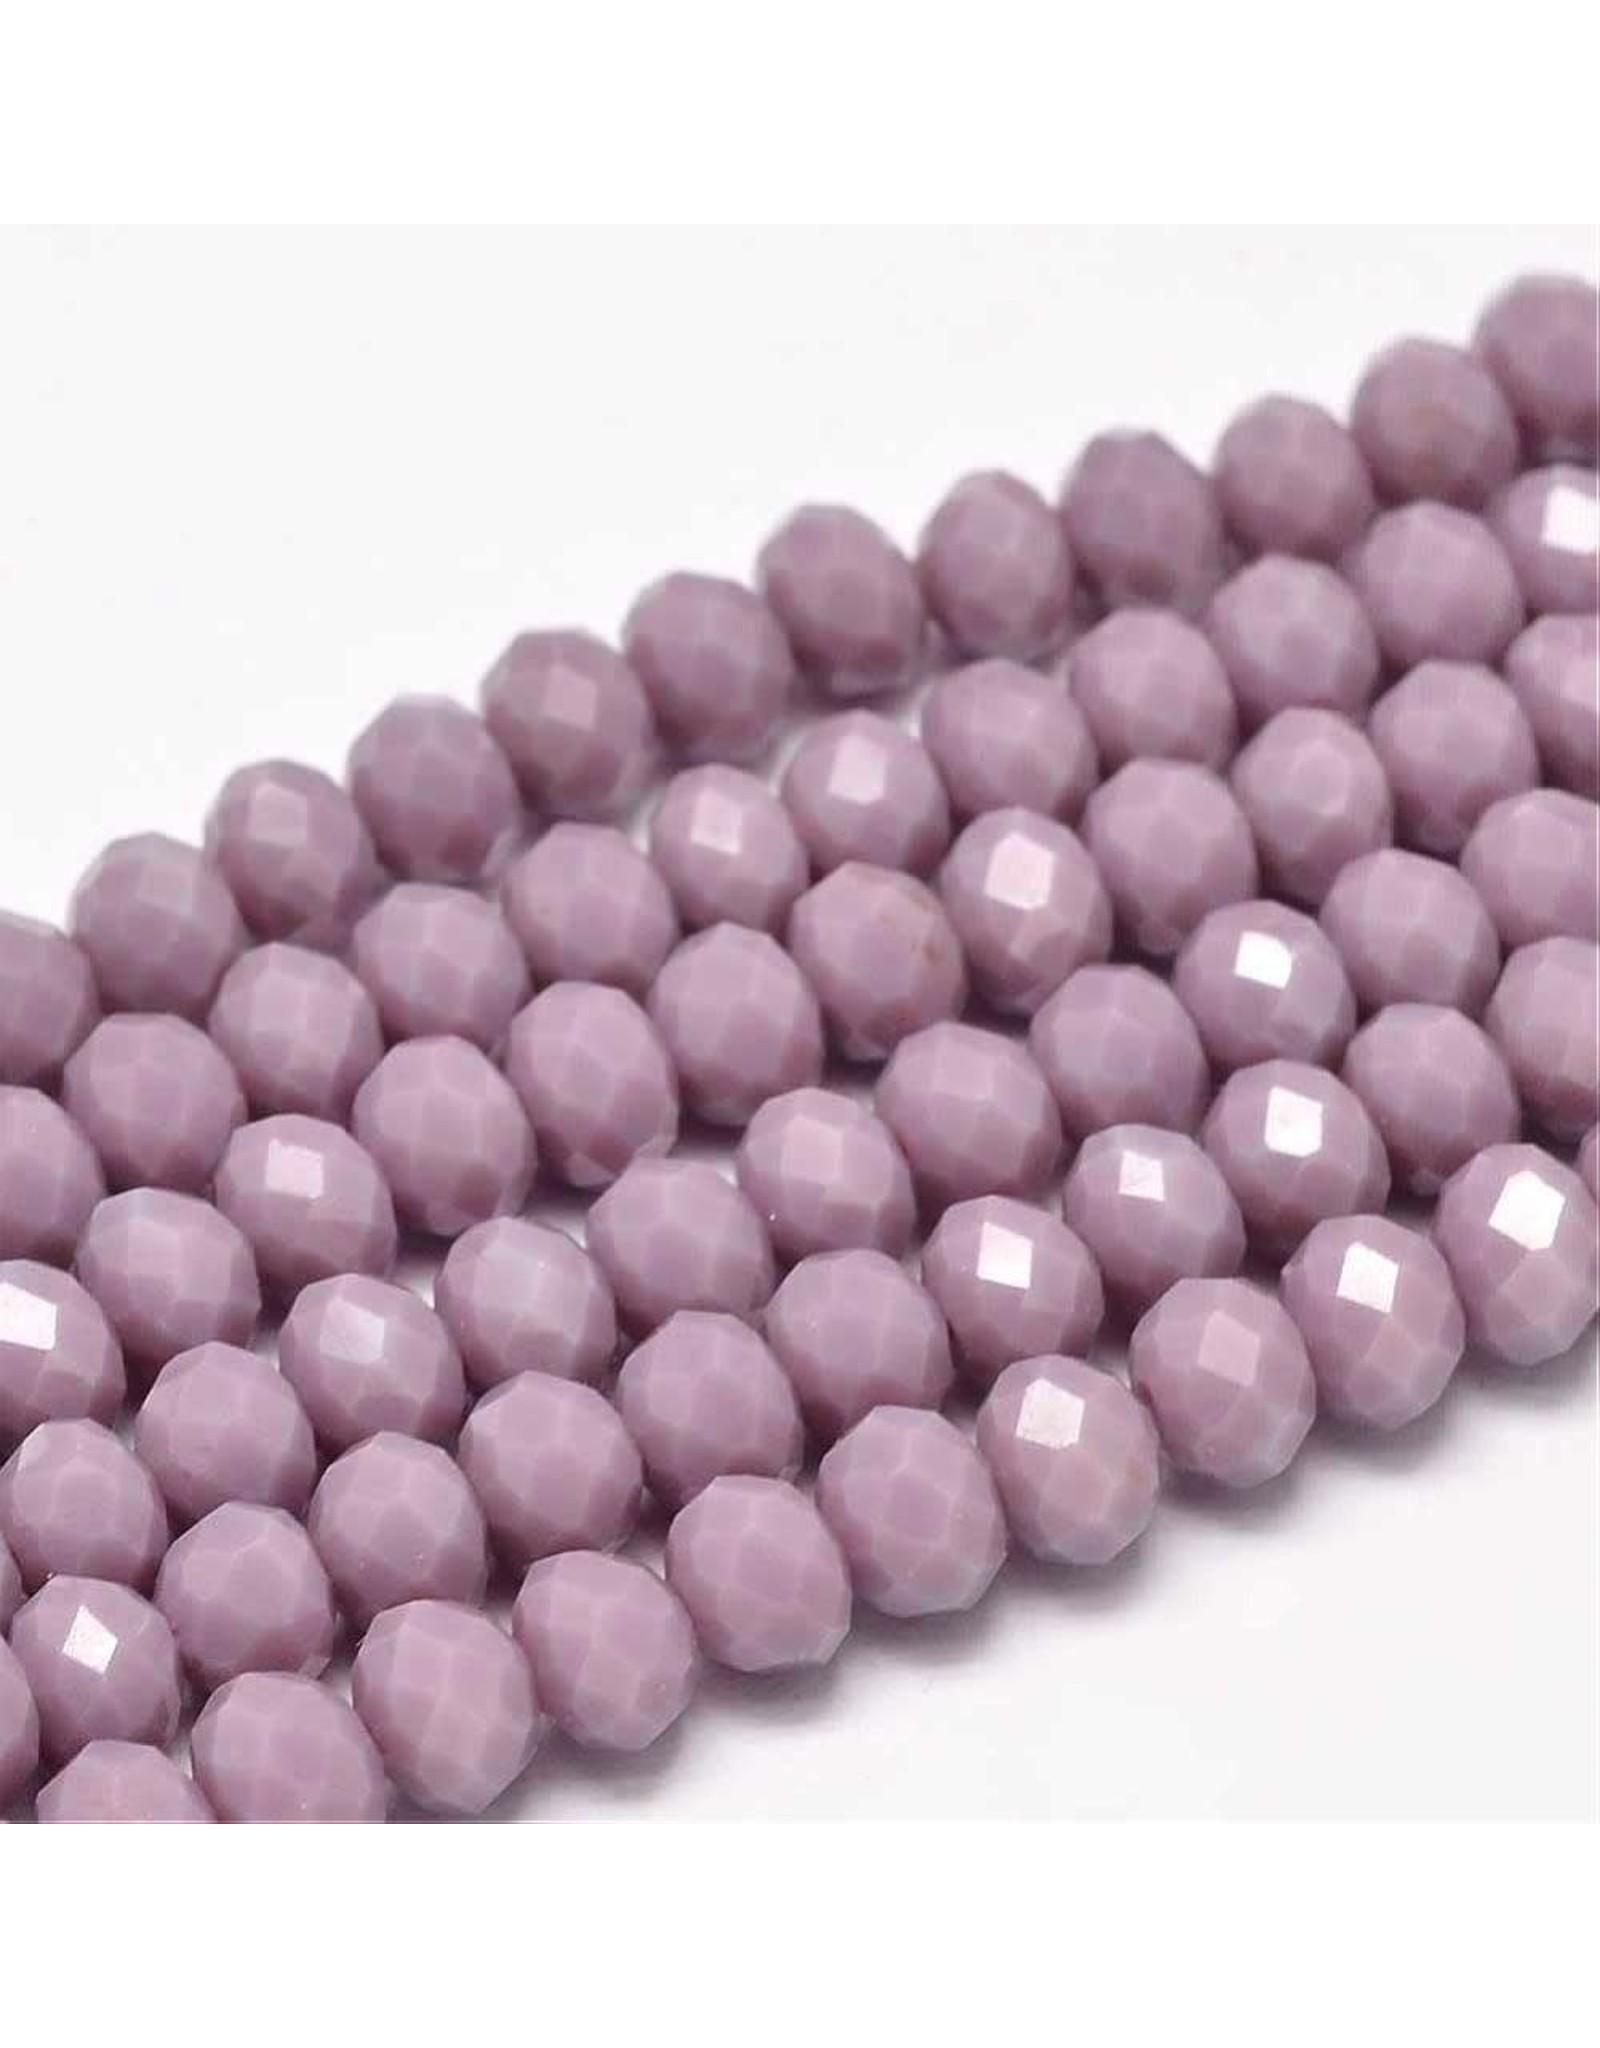 8x6mm Rondelle  Opaque Plum Purple   x65